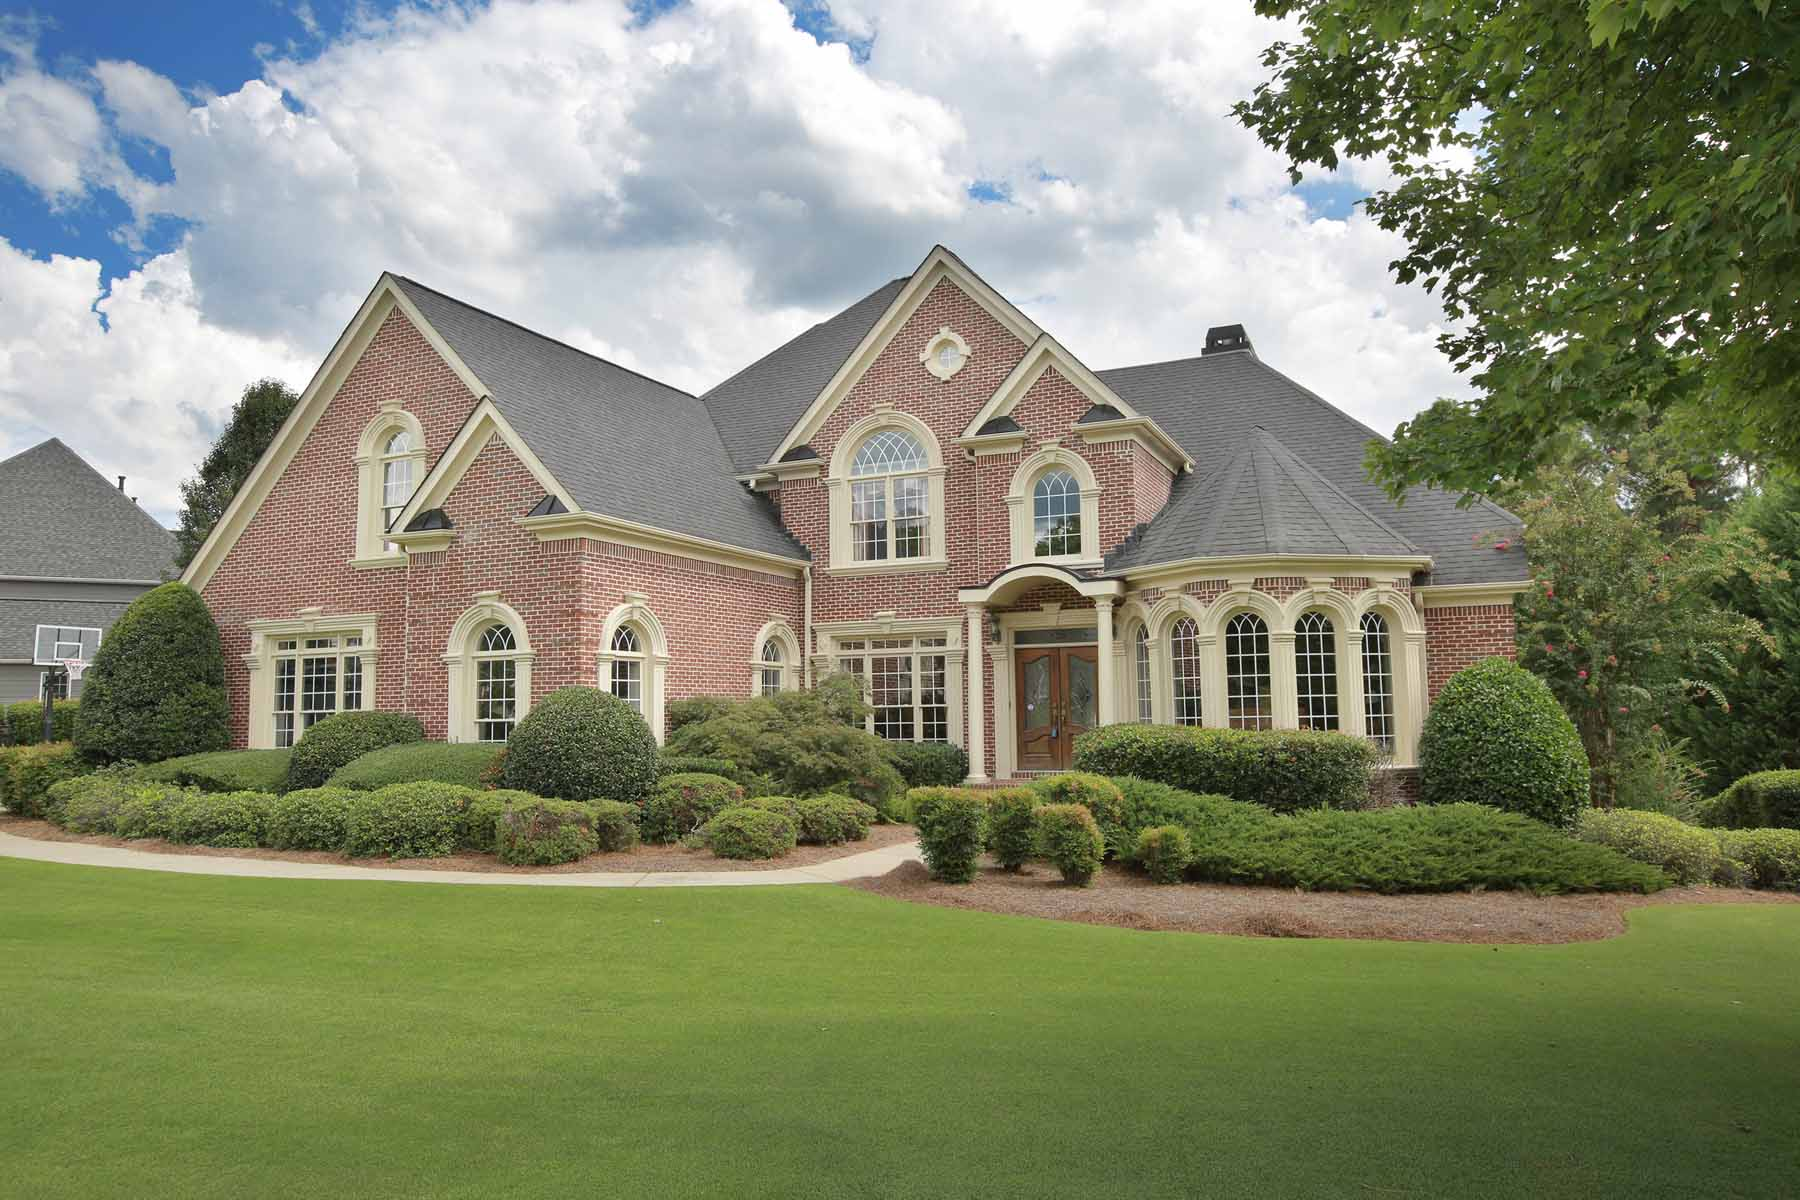 Villa per Vendita alle ore Exemplary Custom Built Home in Reserve at Bridgemill 2025 Gold Leaf Parkway Canton, Georgia, 30114 Stati Uniti